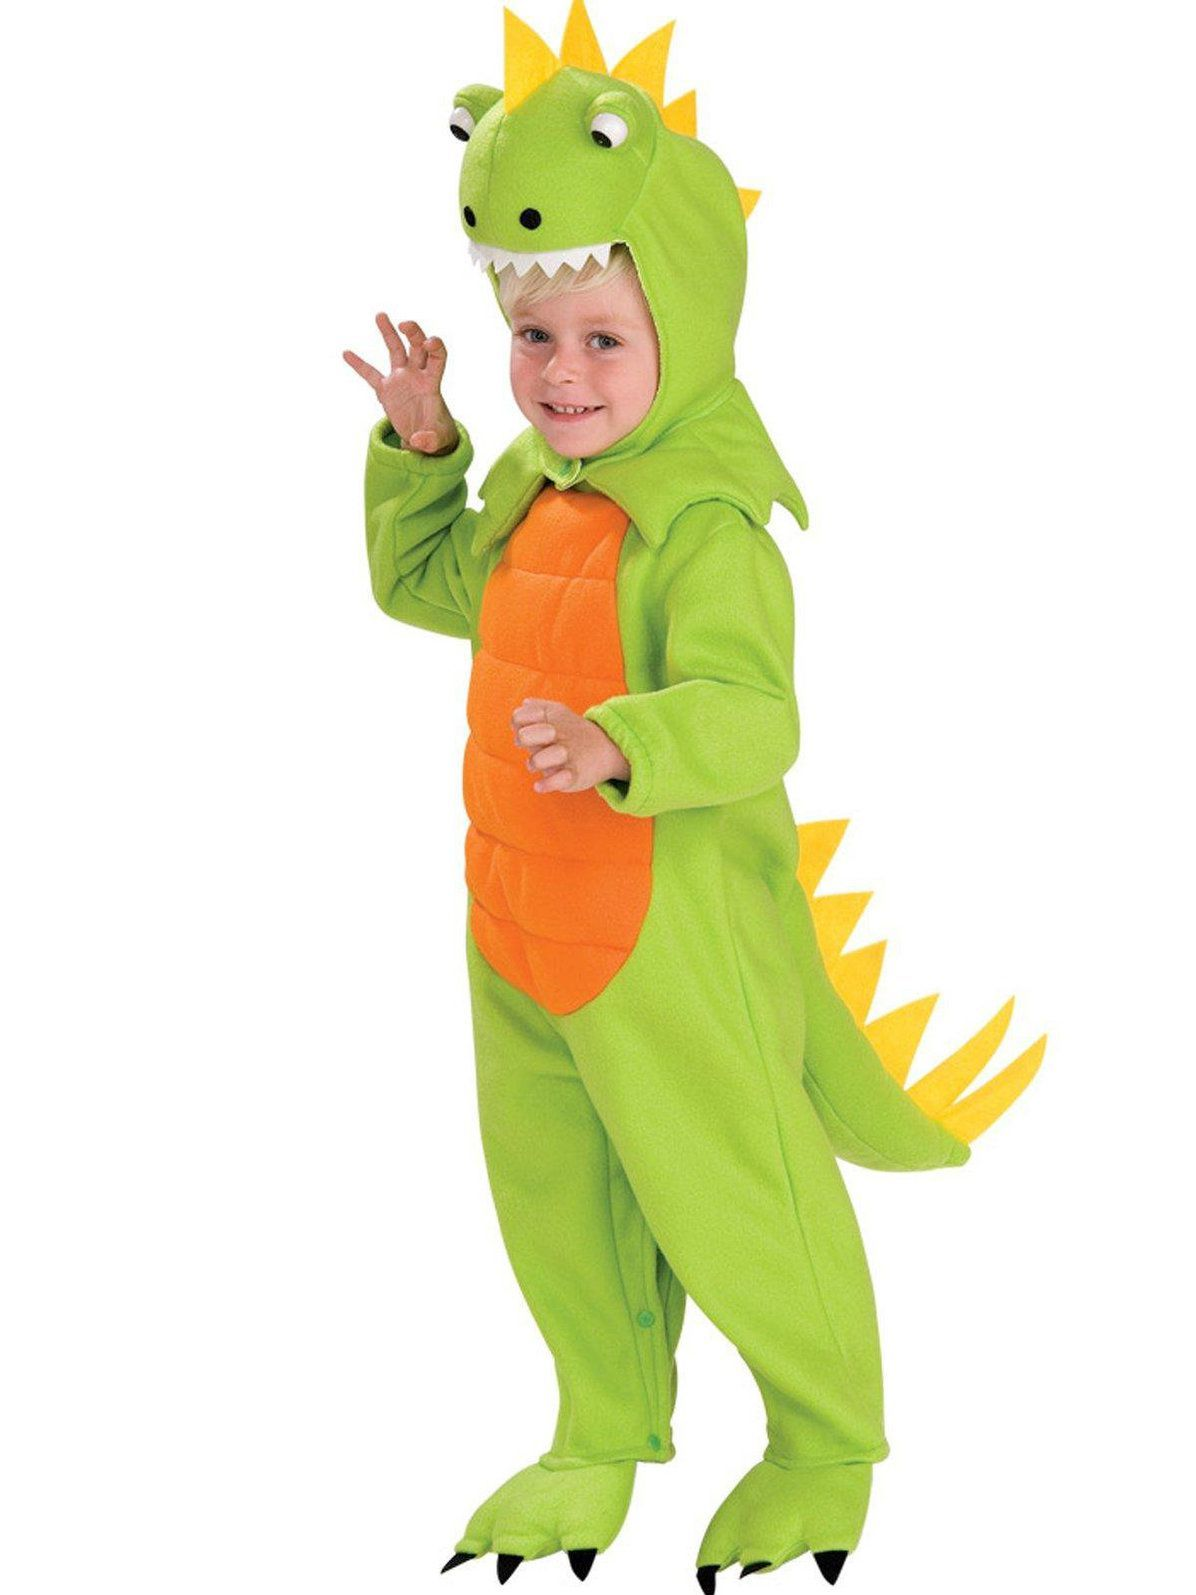 Cute Lil Dinosaur Toddler Costume Kids Dinosaur Costume Dinosaur Halloween Costume Toddler Dinosaur Costume